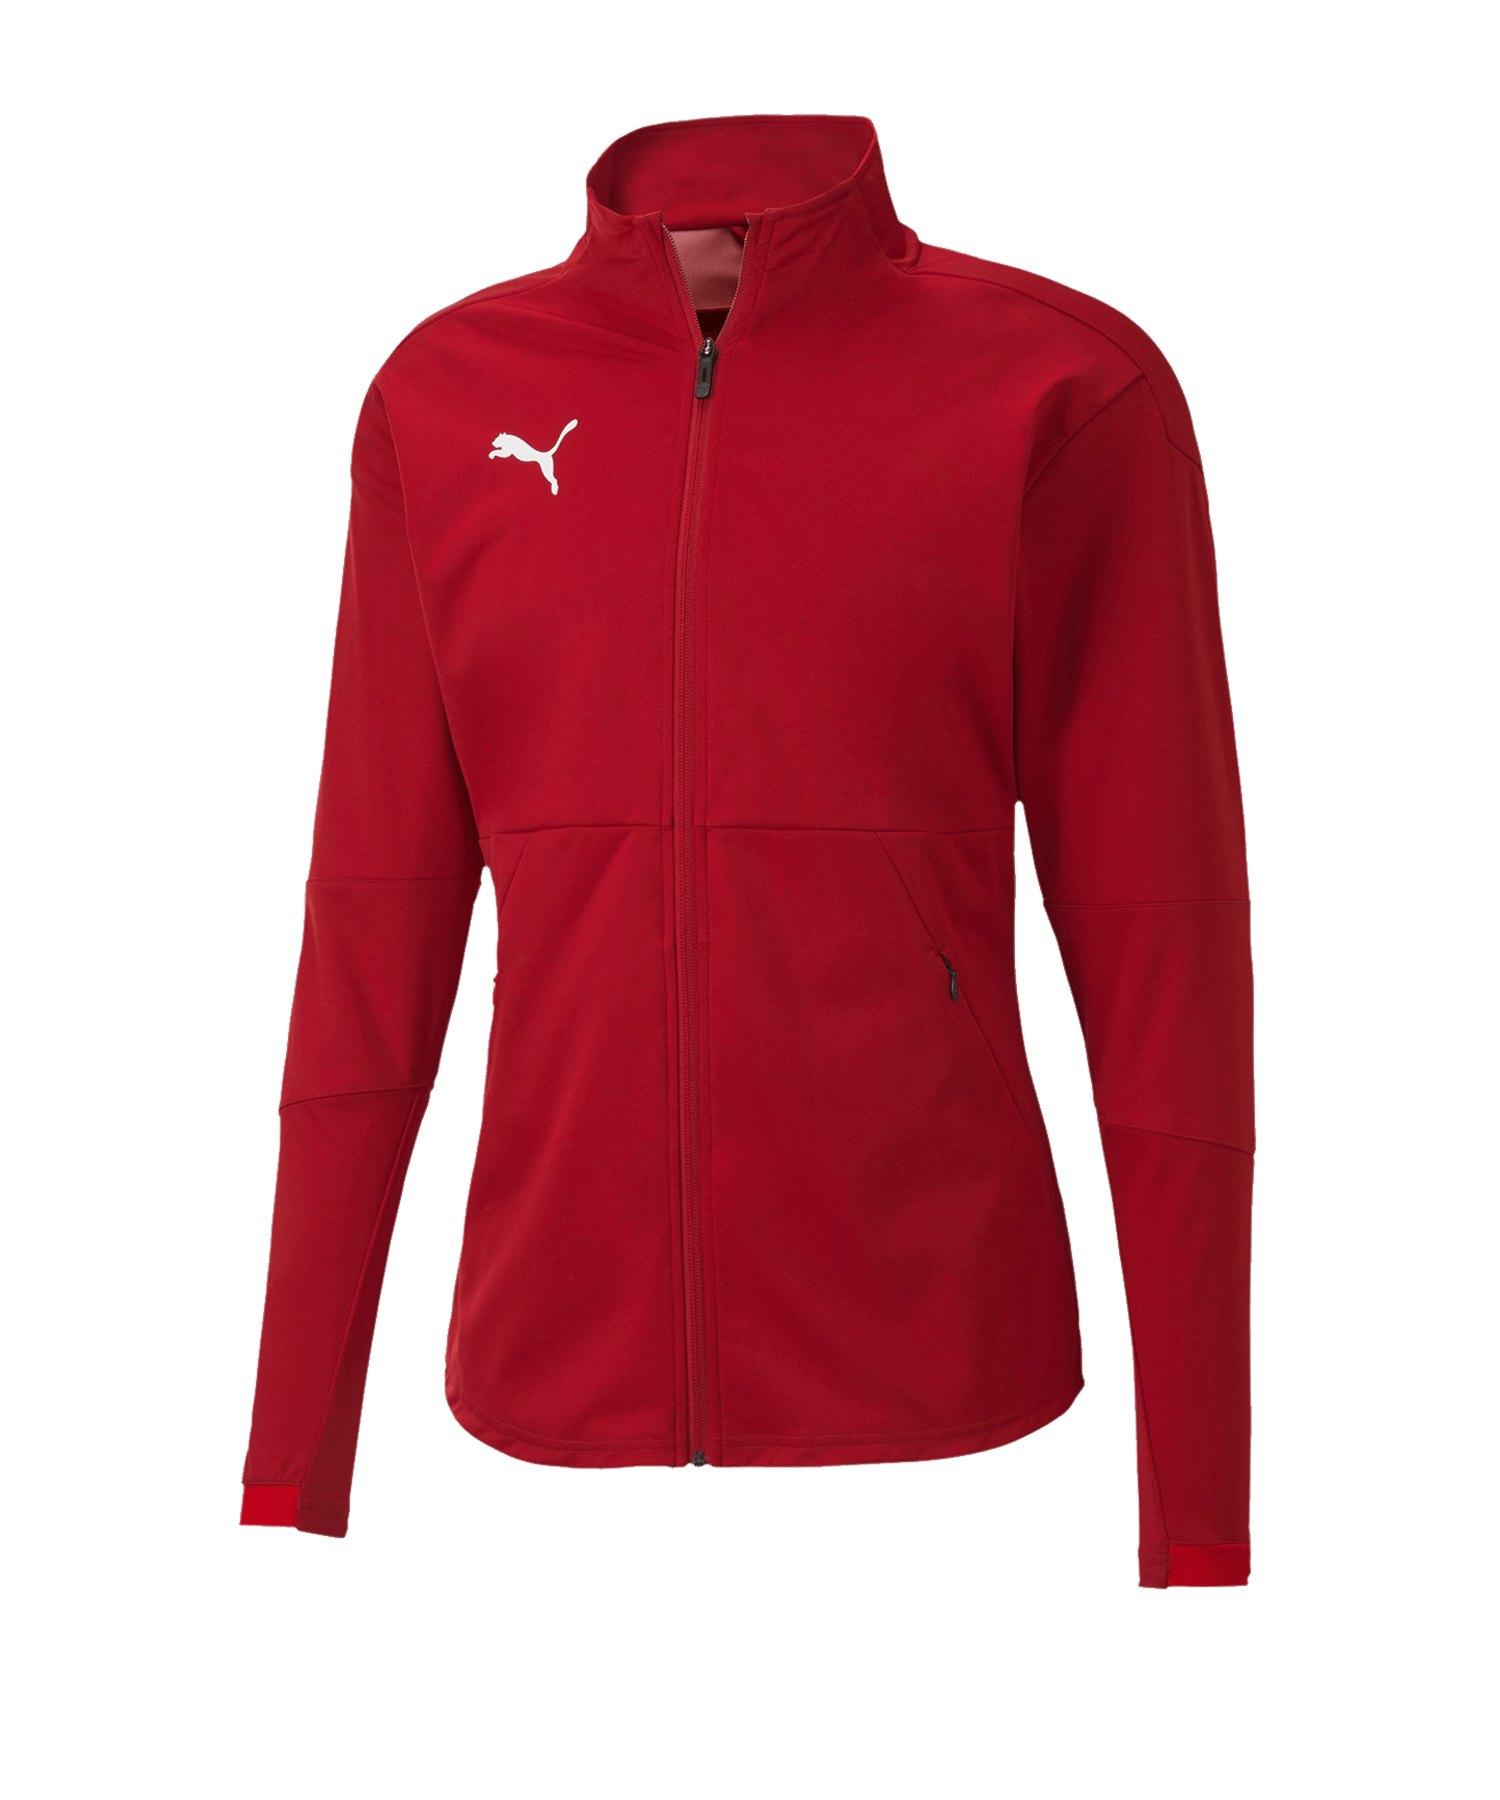 PUMA teamFINAL 21 Sideline Trainingsjacke Rot F01 - rot